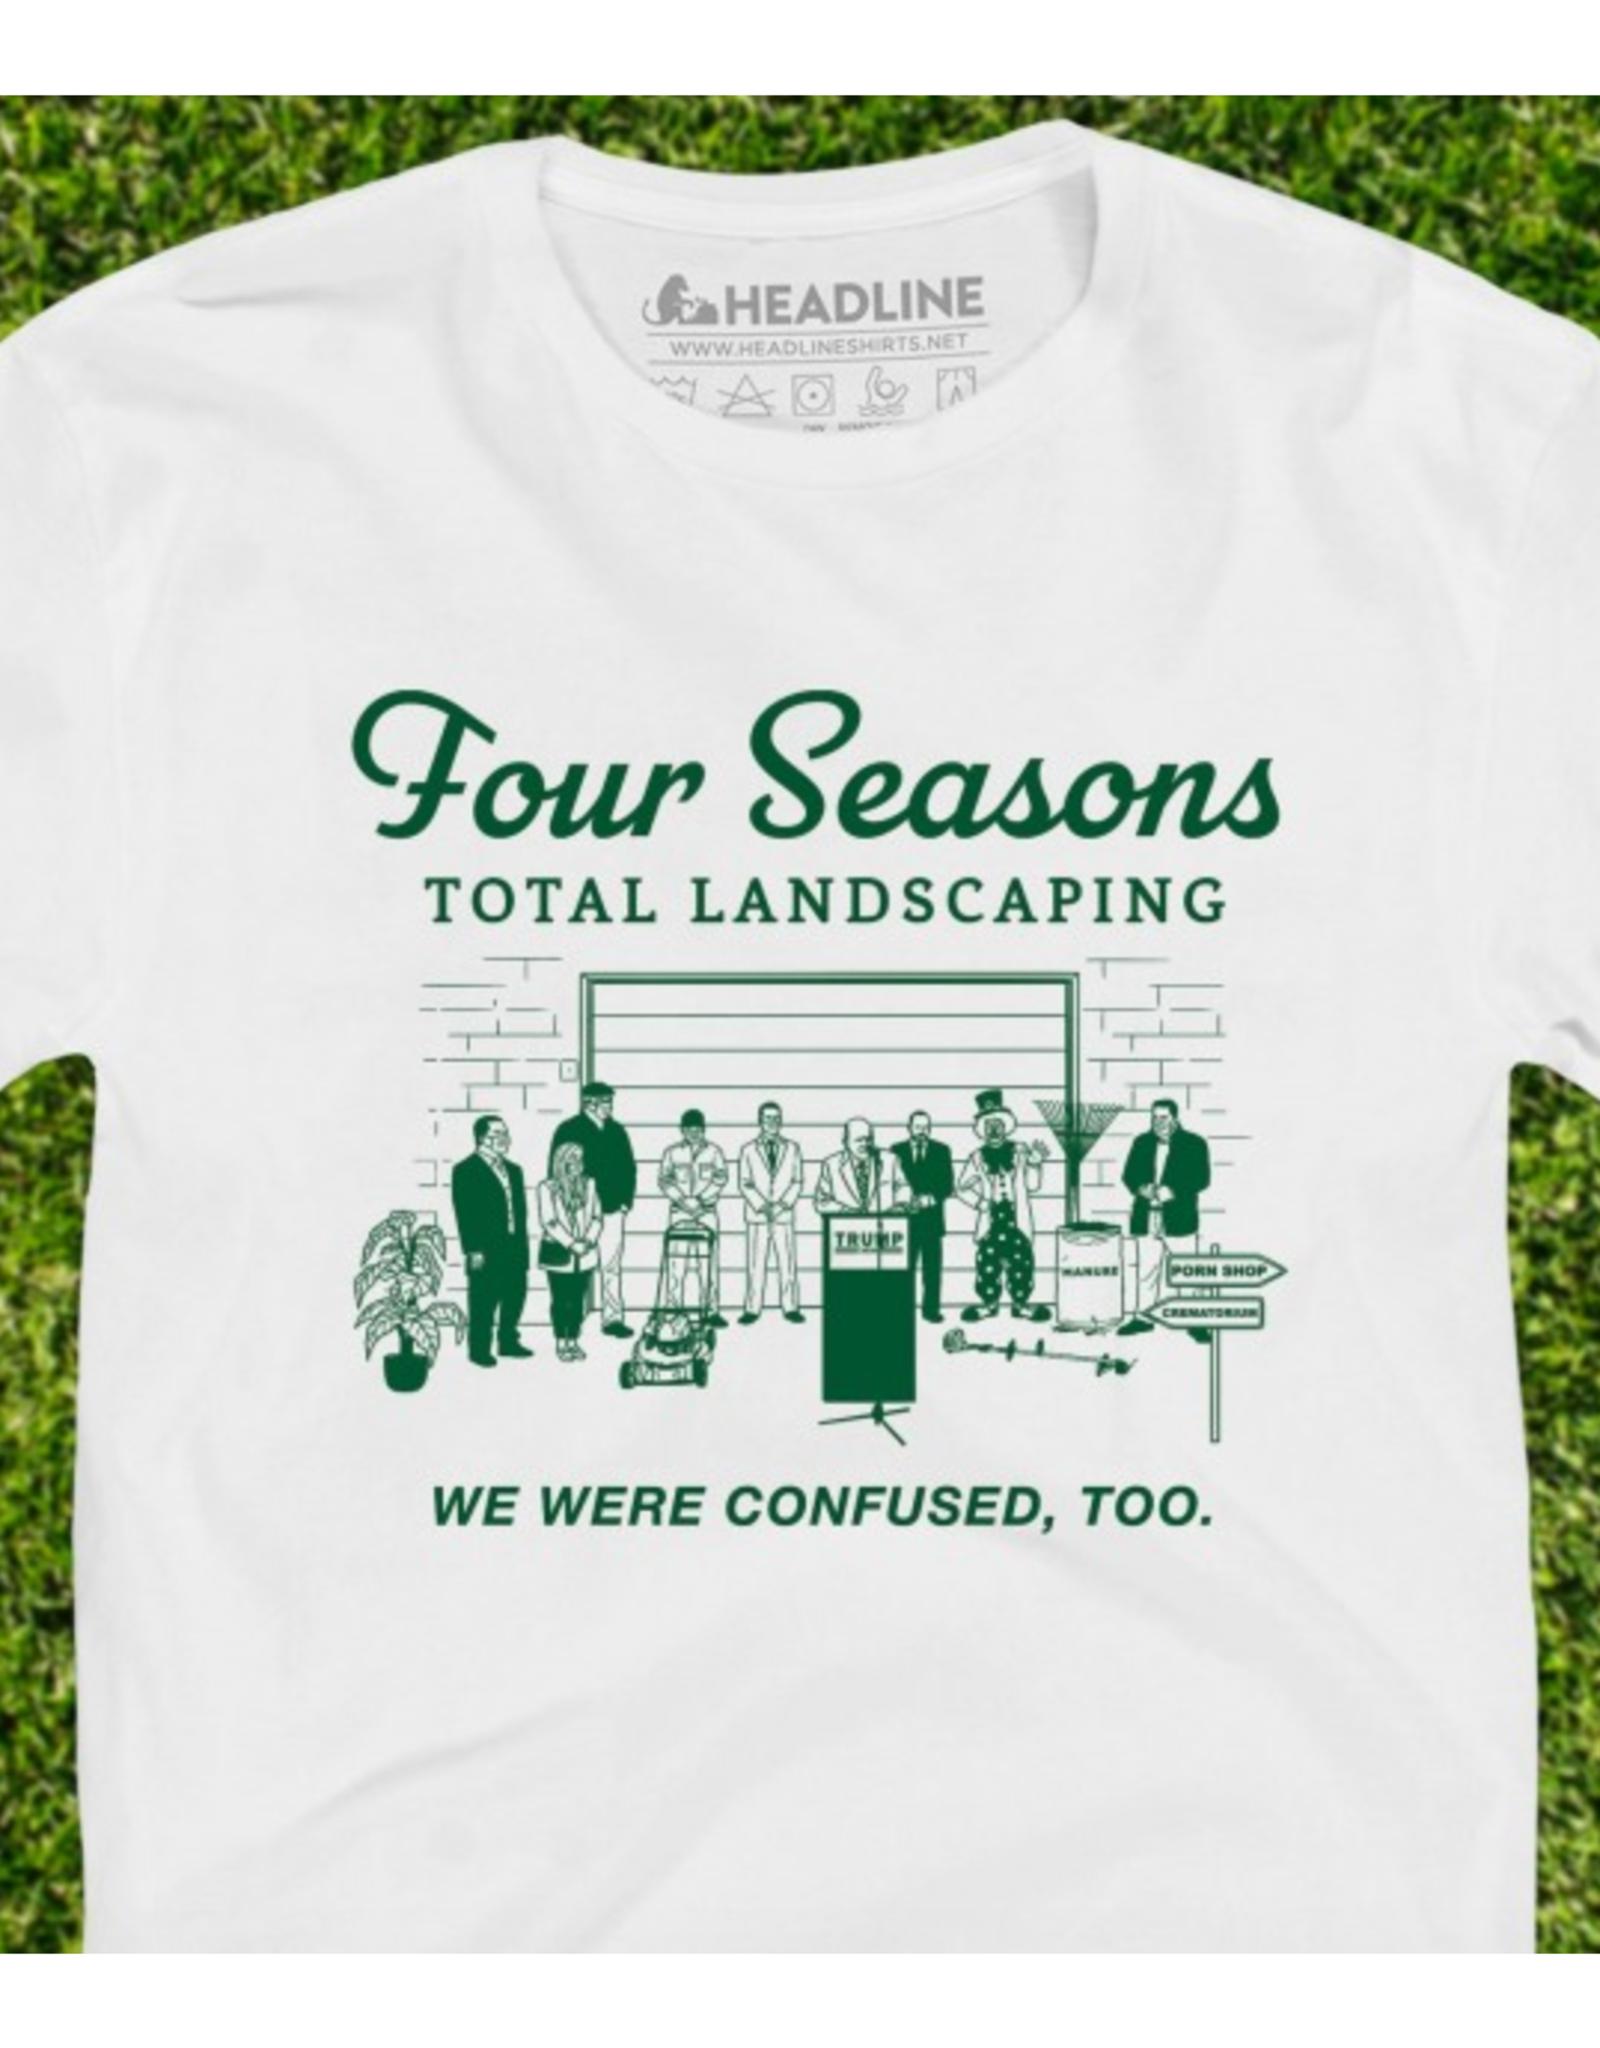 Four Seasons Total Landscaping T-shirt